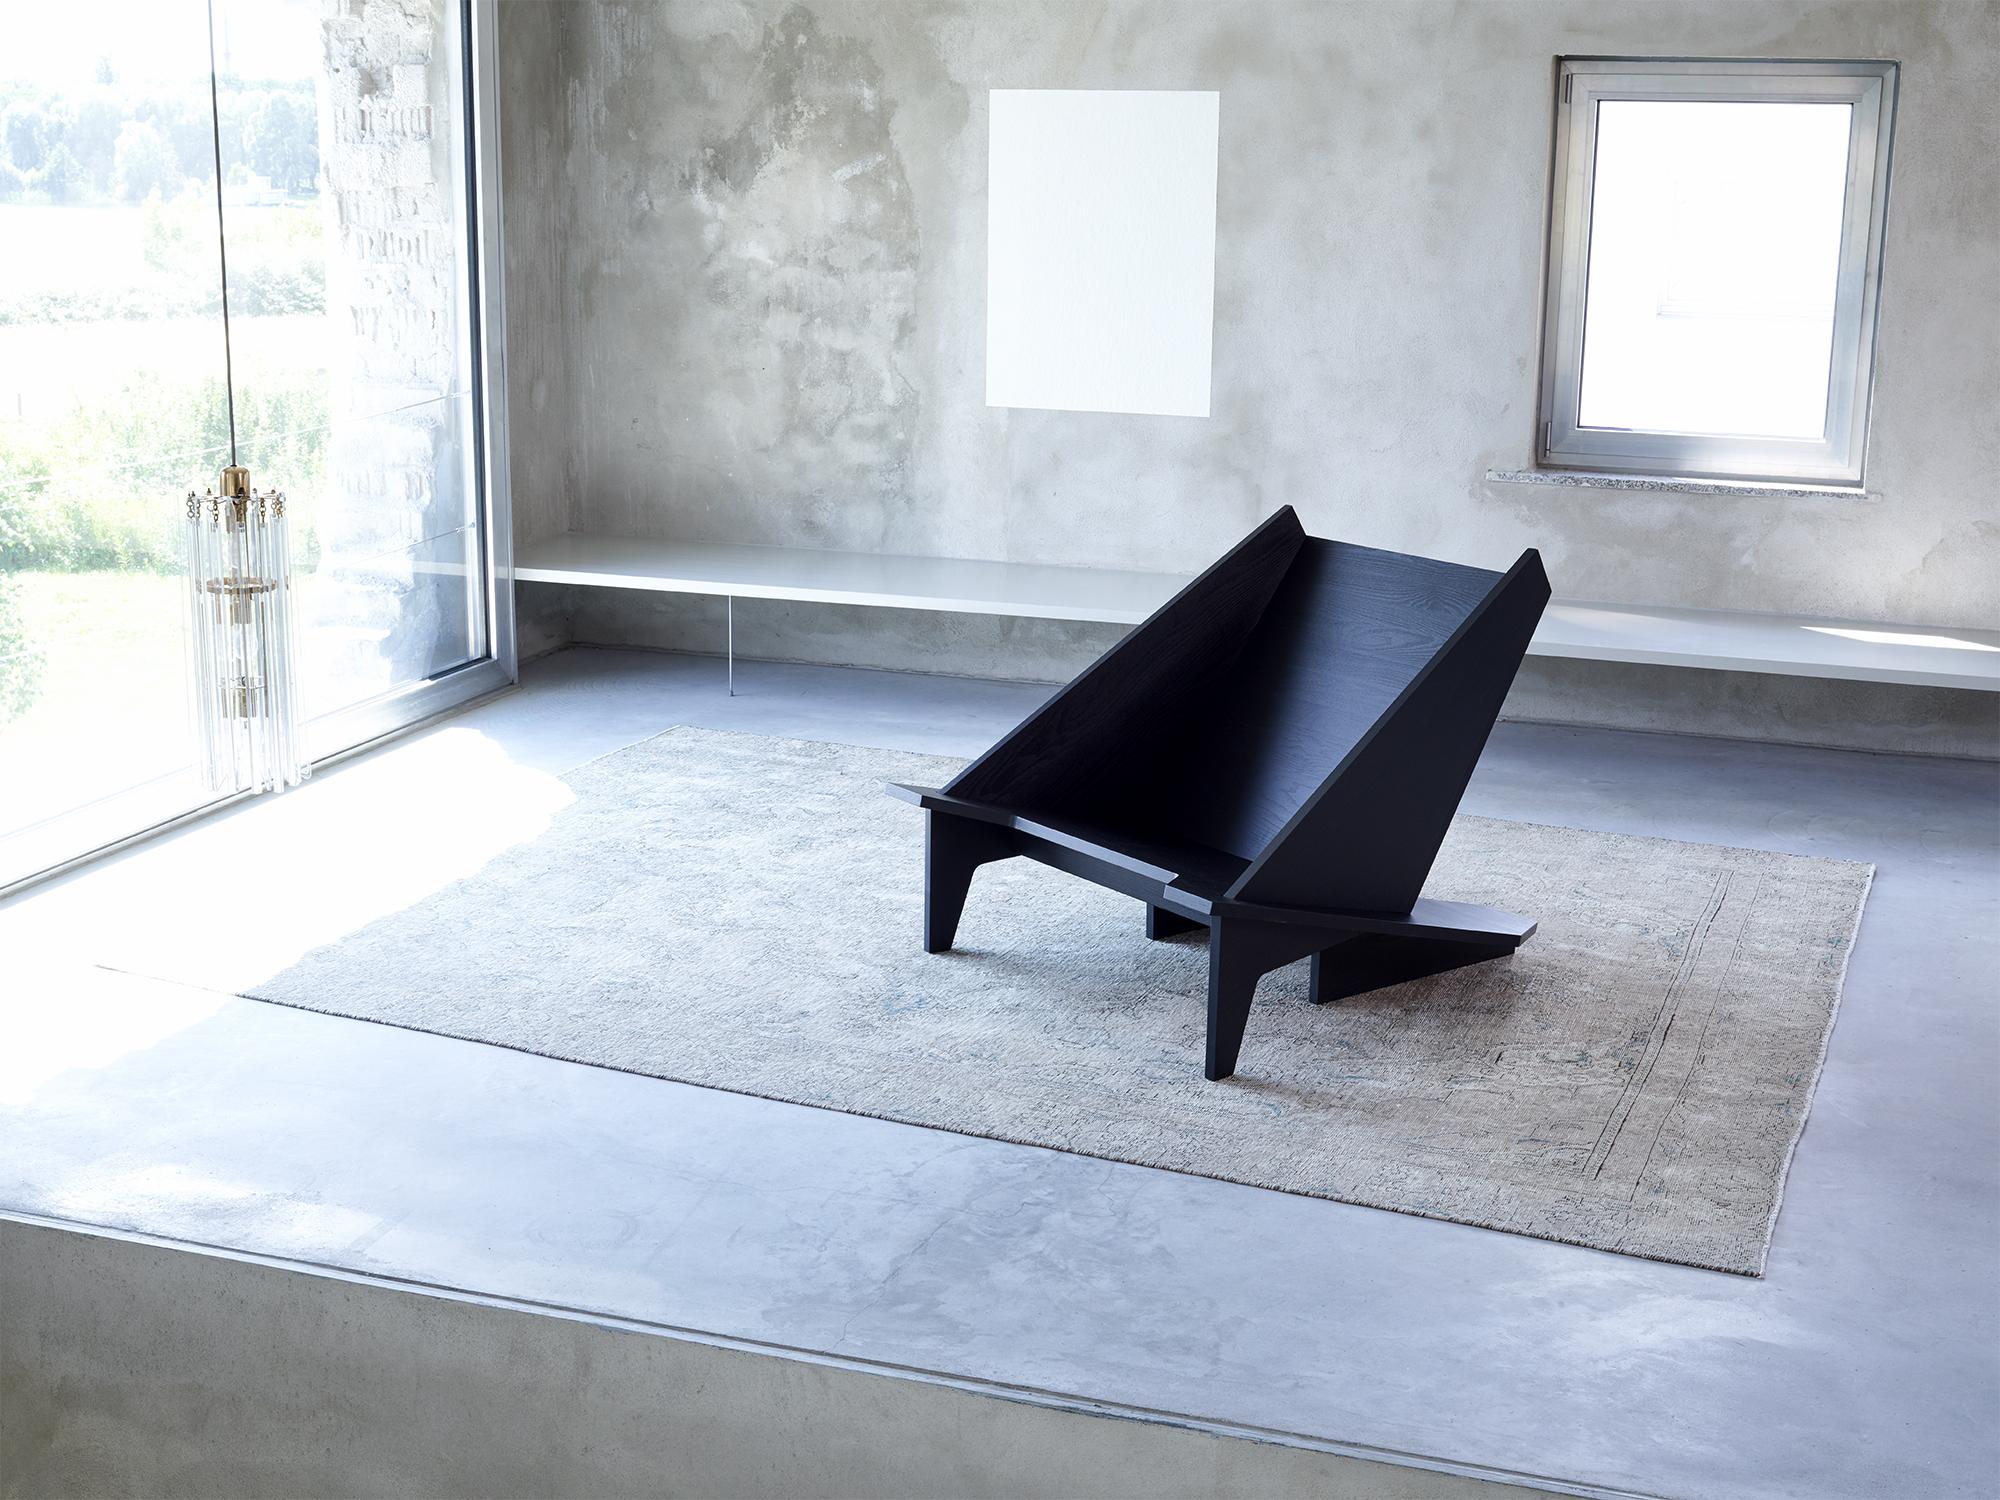 objekte-unserer-tage-3407-villa-14-takahashi-lounge-chair